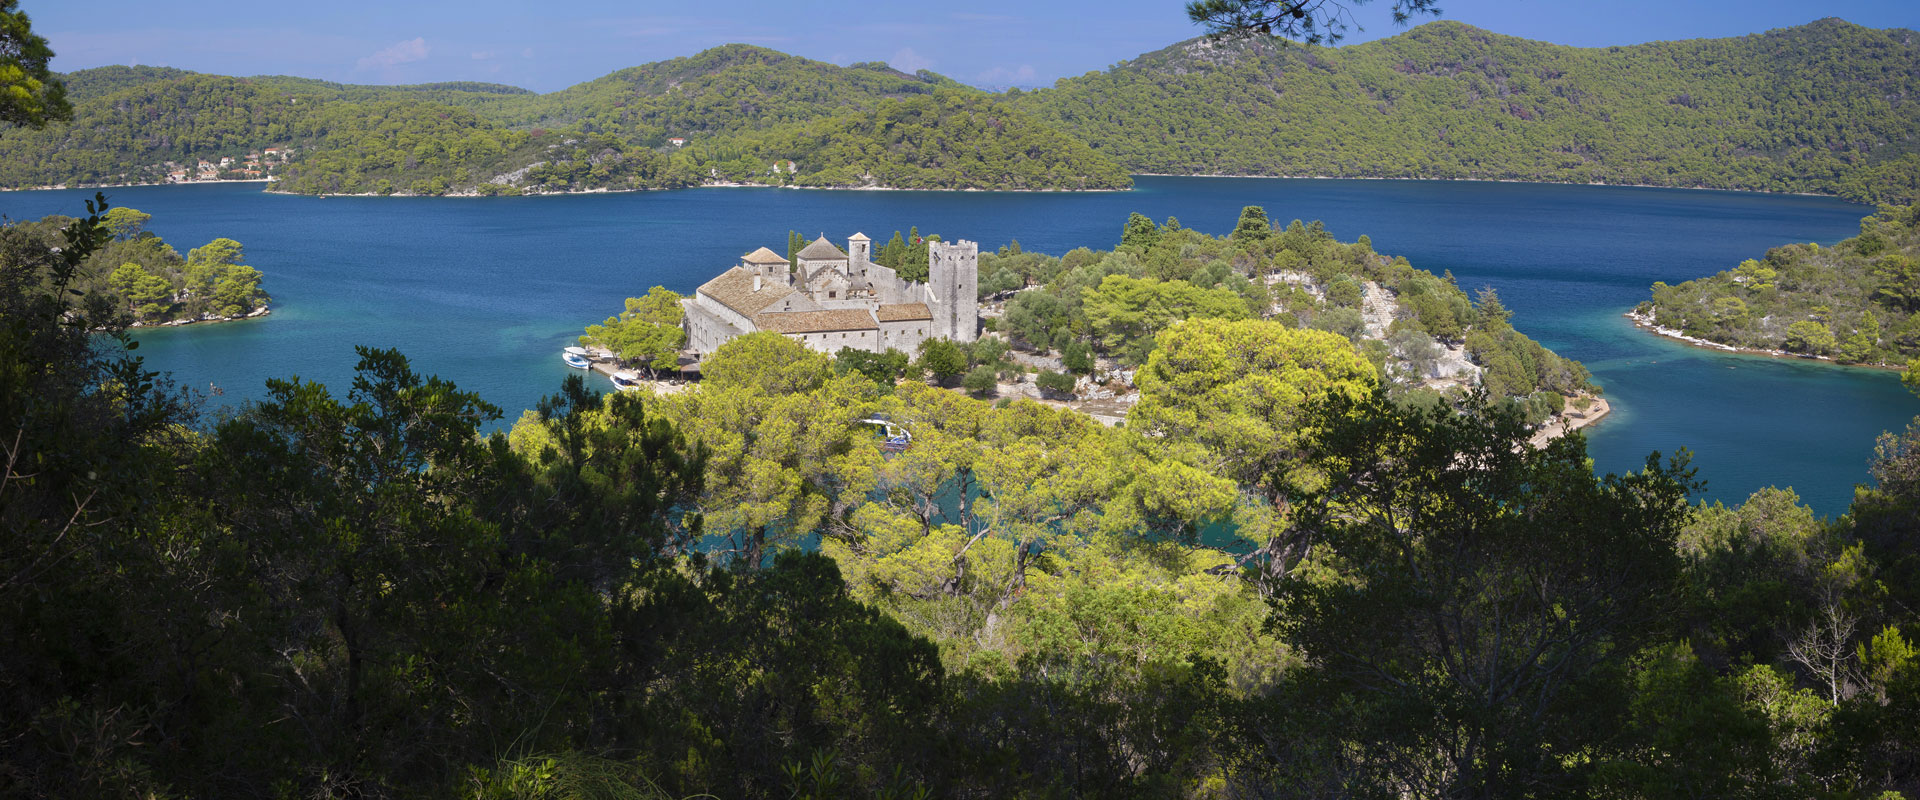 Hiking Dubrovnik's coast & islands